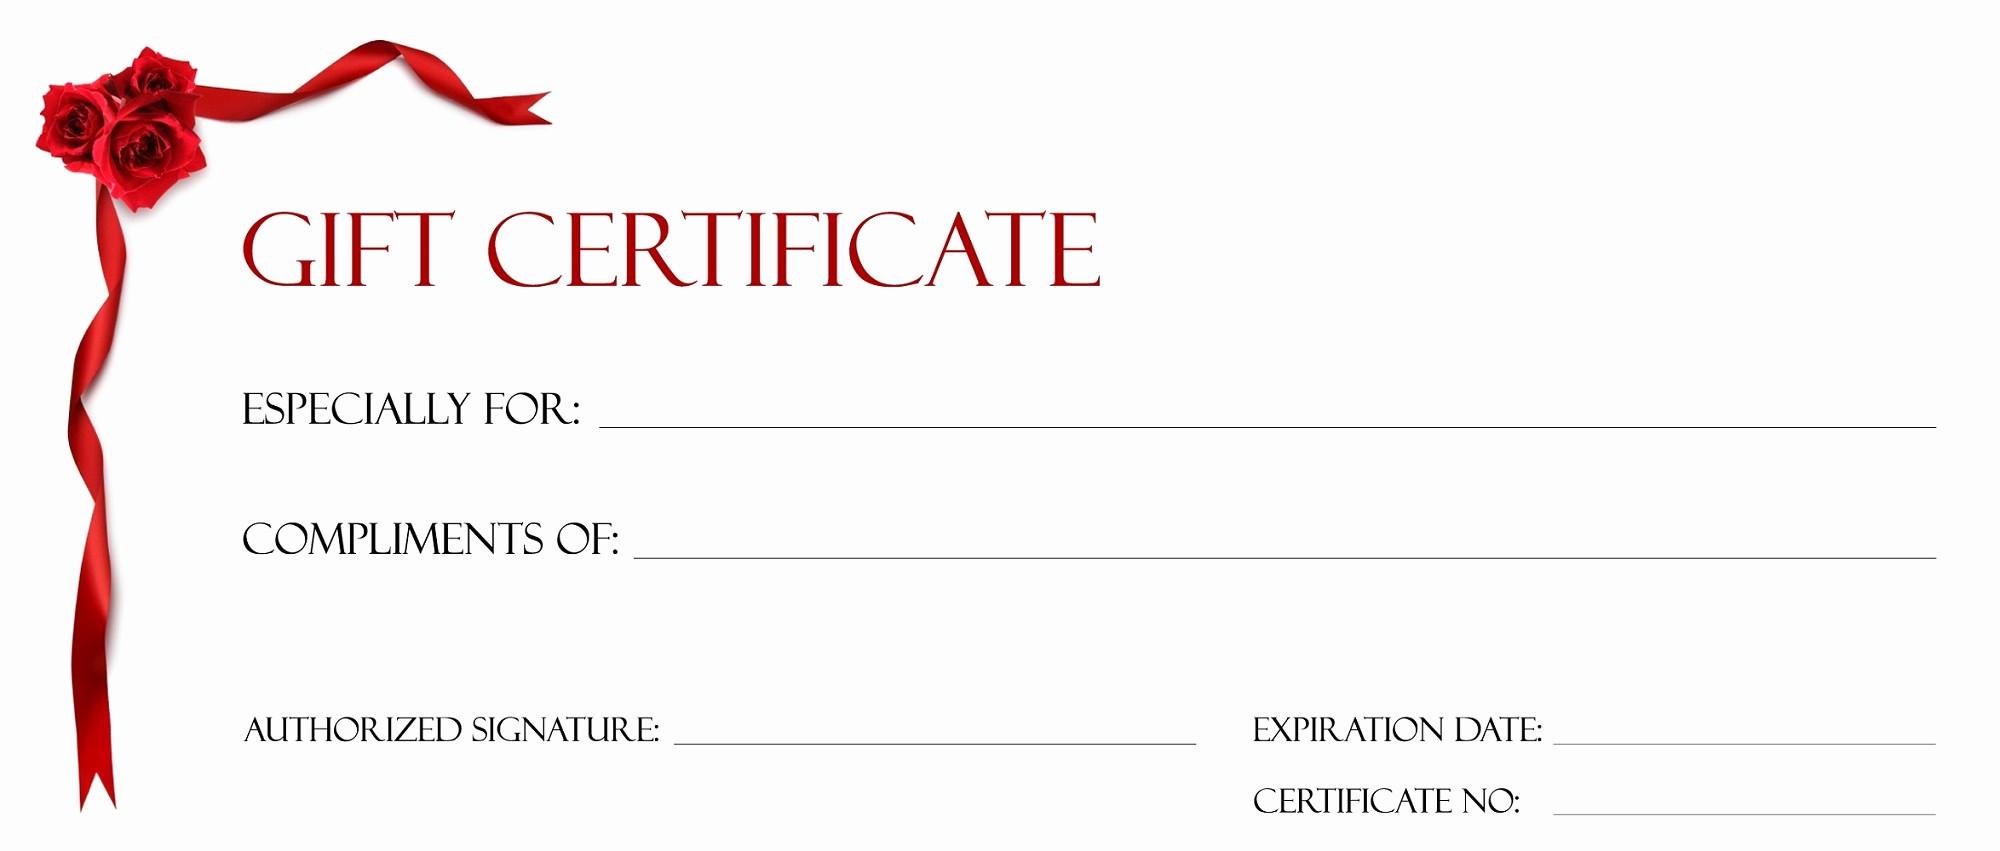 Making Gift Certificates Online Free Elegant Gift Certificate Template for Kids Blanks